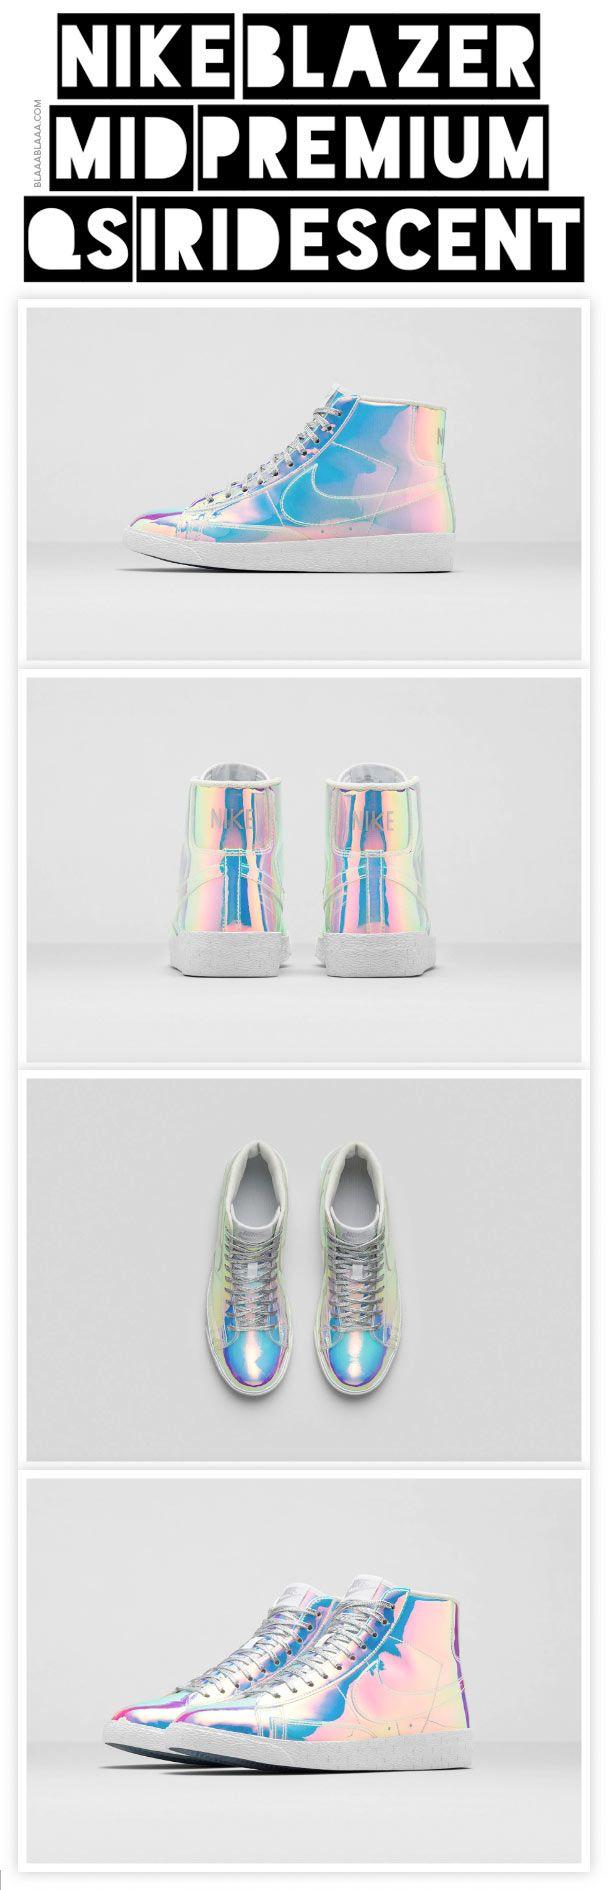 Nike Blazer Mid Premium QS Iridescent @simaruth